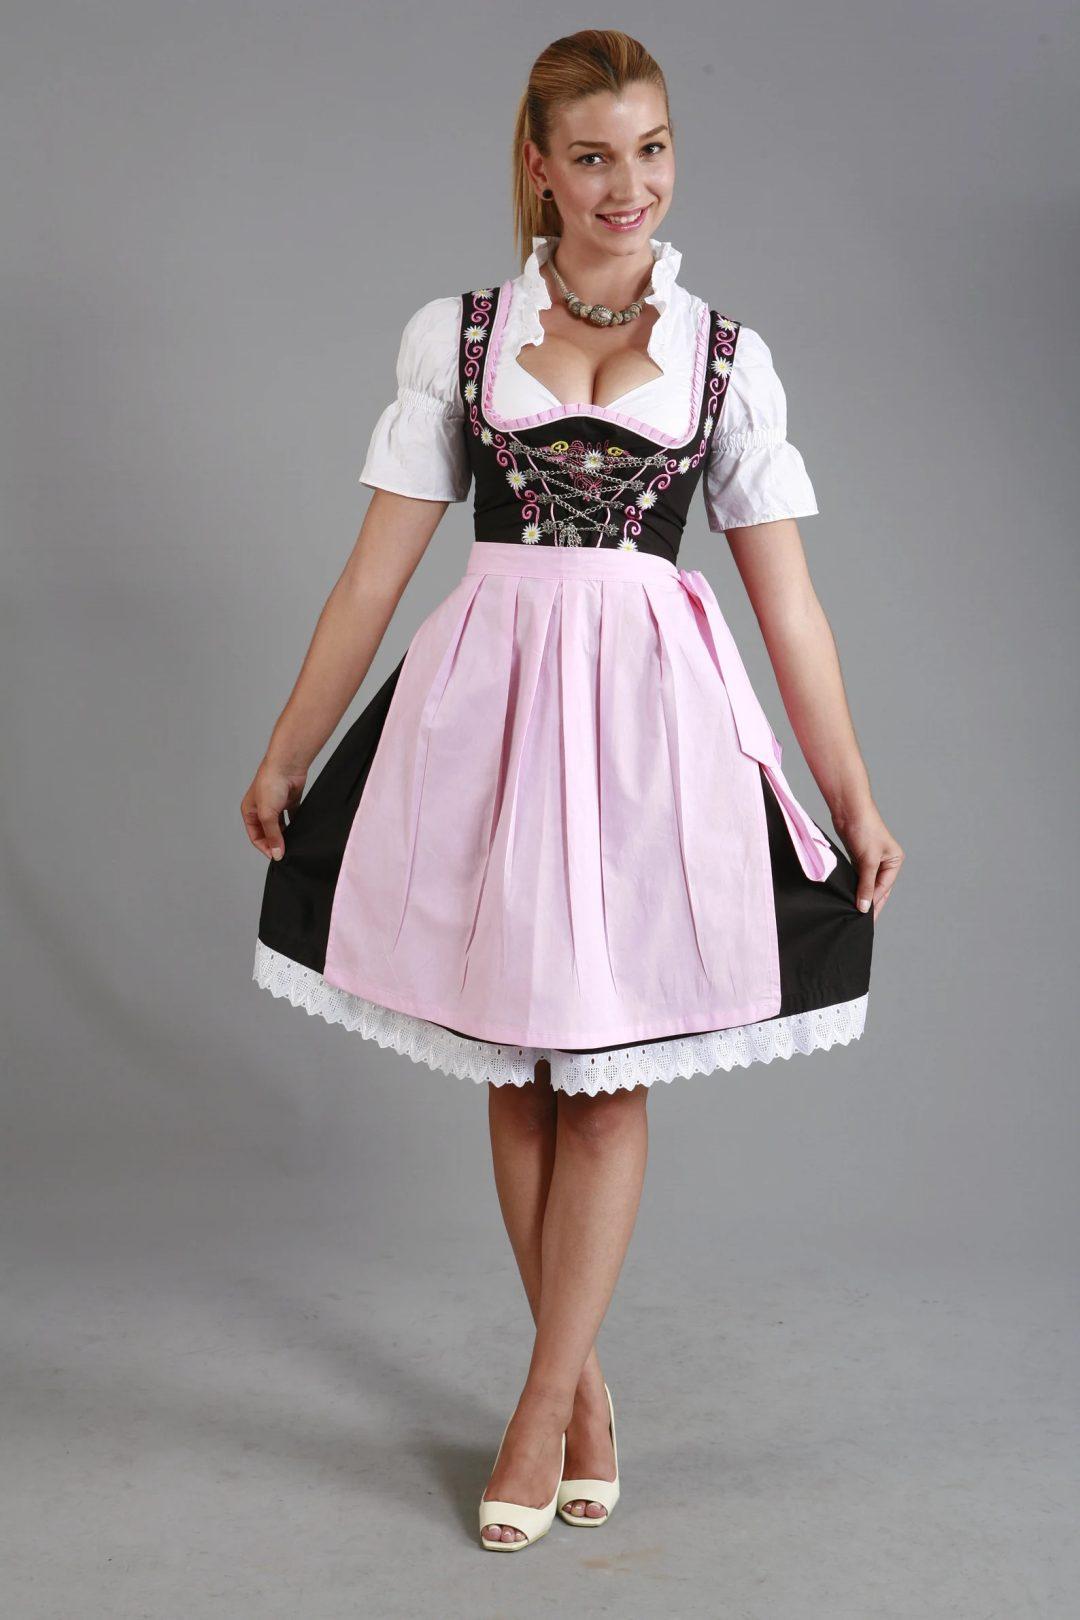 What to wear to an Oktoberfest party: Pastel pink oktoberfest dirndl dress